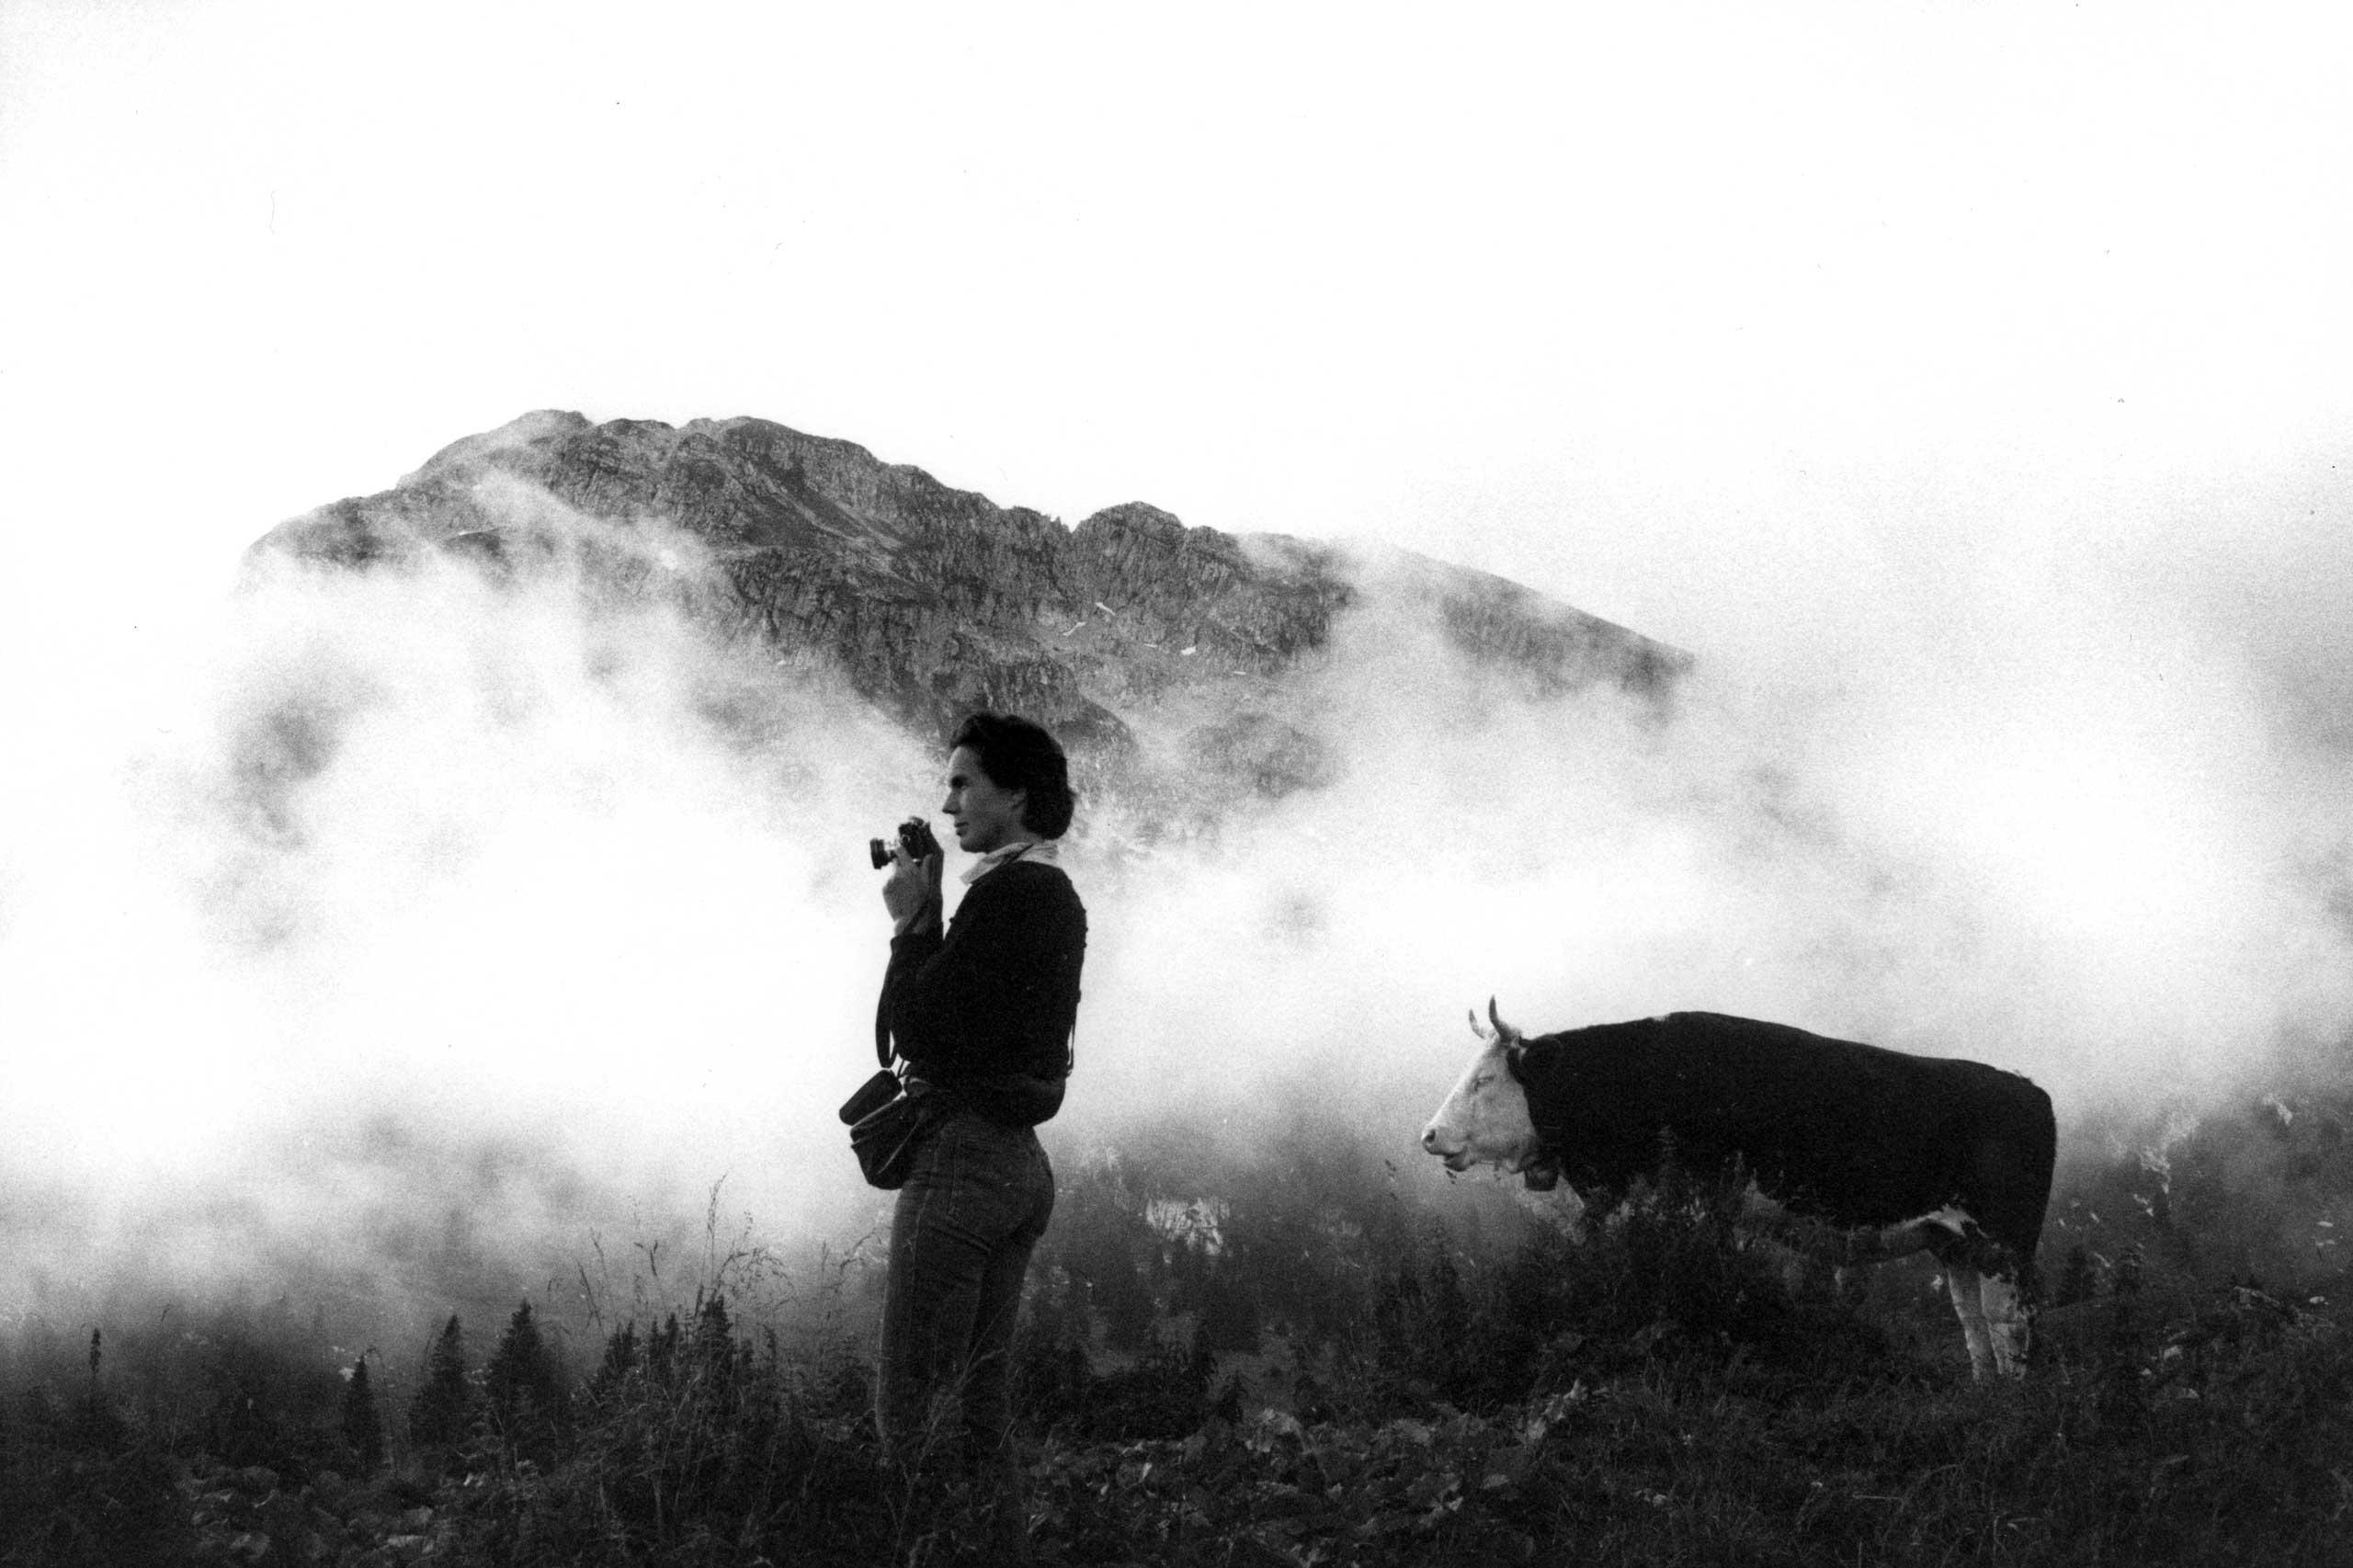 Martine Franck in Switzerland in 1984.